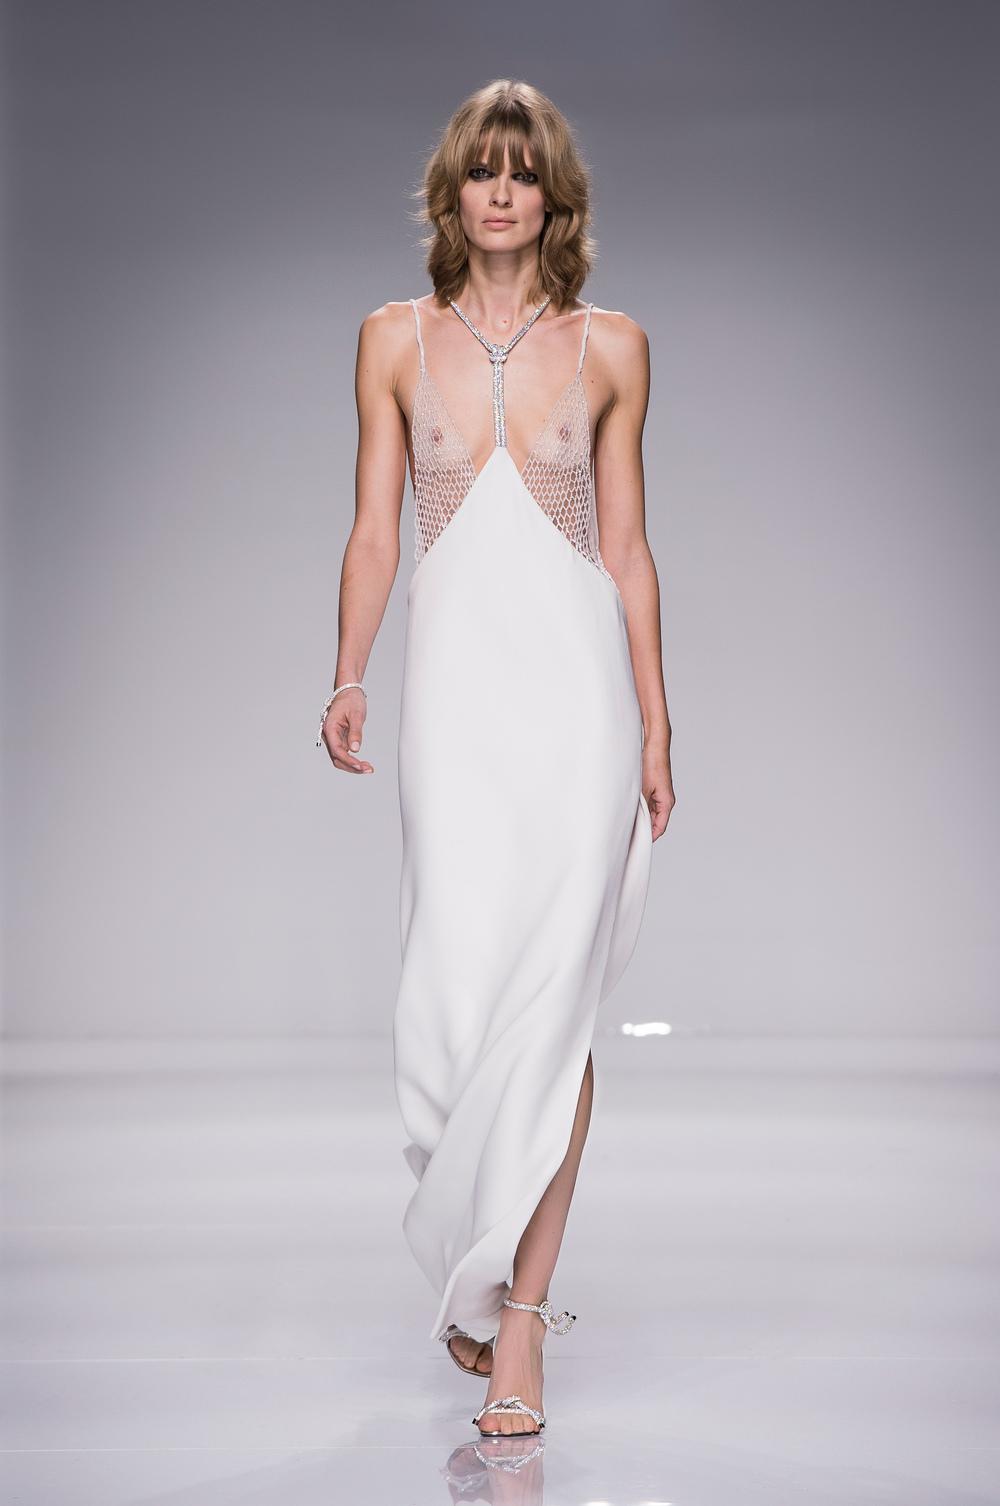 Atelier Versace SS16_Look 39.JPG